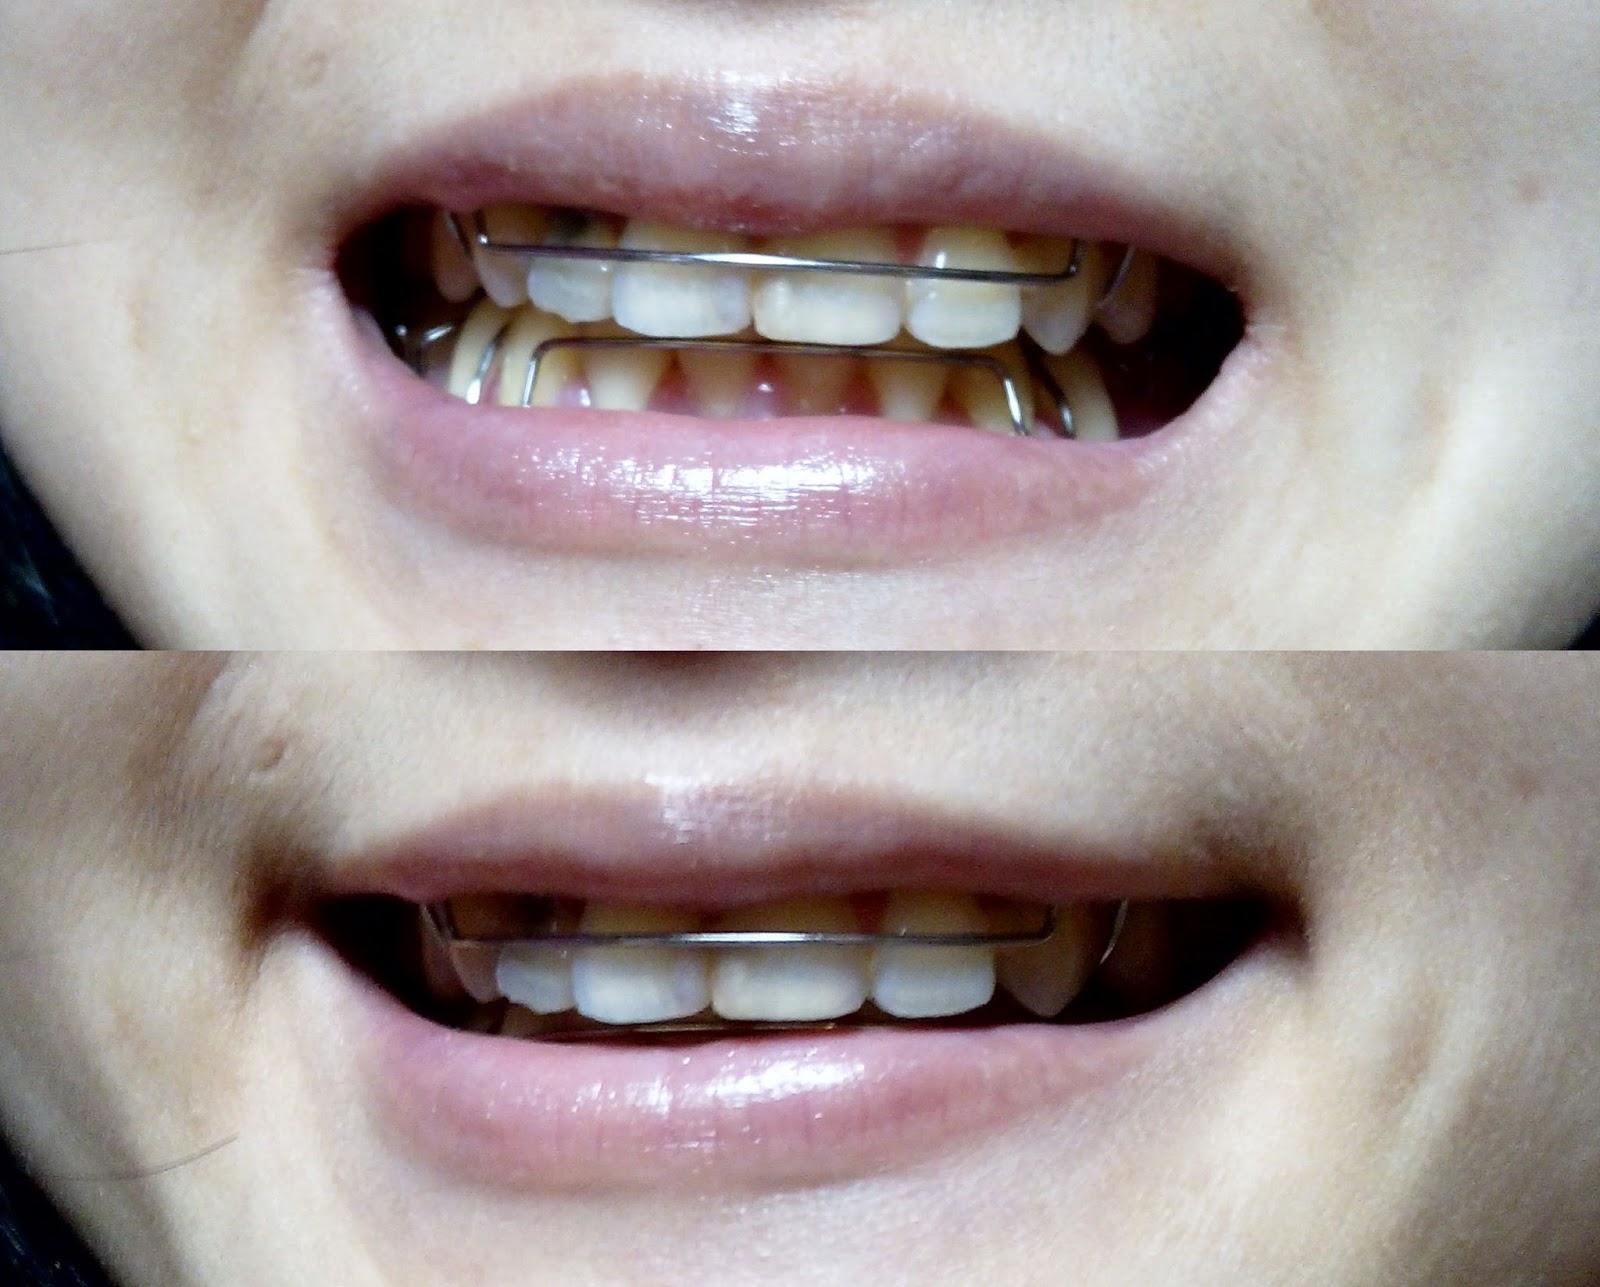 pasang behel di Surabaya, pasang behel bagus di Surabaya, dokter ortodontis Surabaya, Pengalaman pasang behel